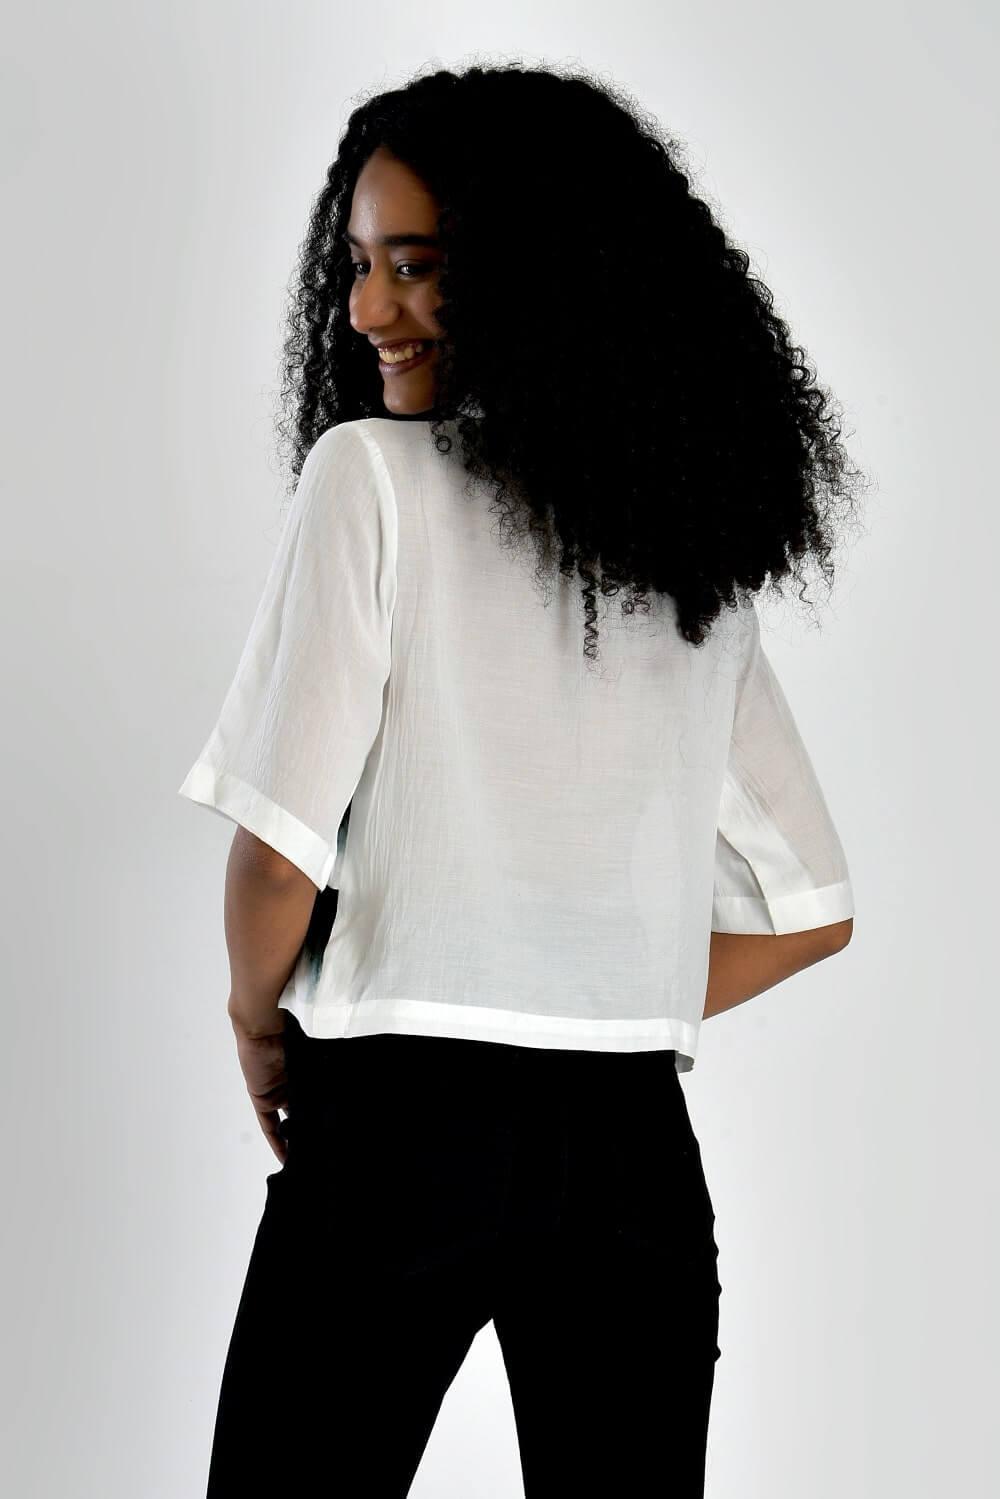 @STOREAT44 | Best Black&White Clothing Brand | 6